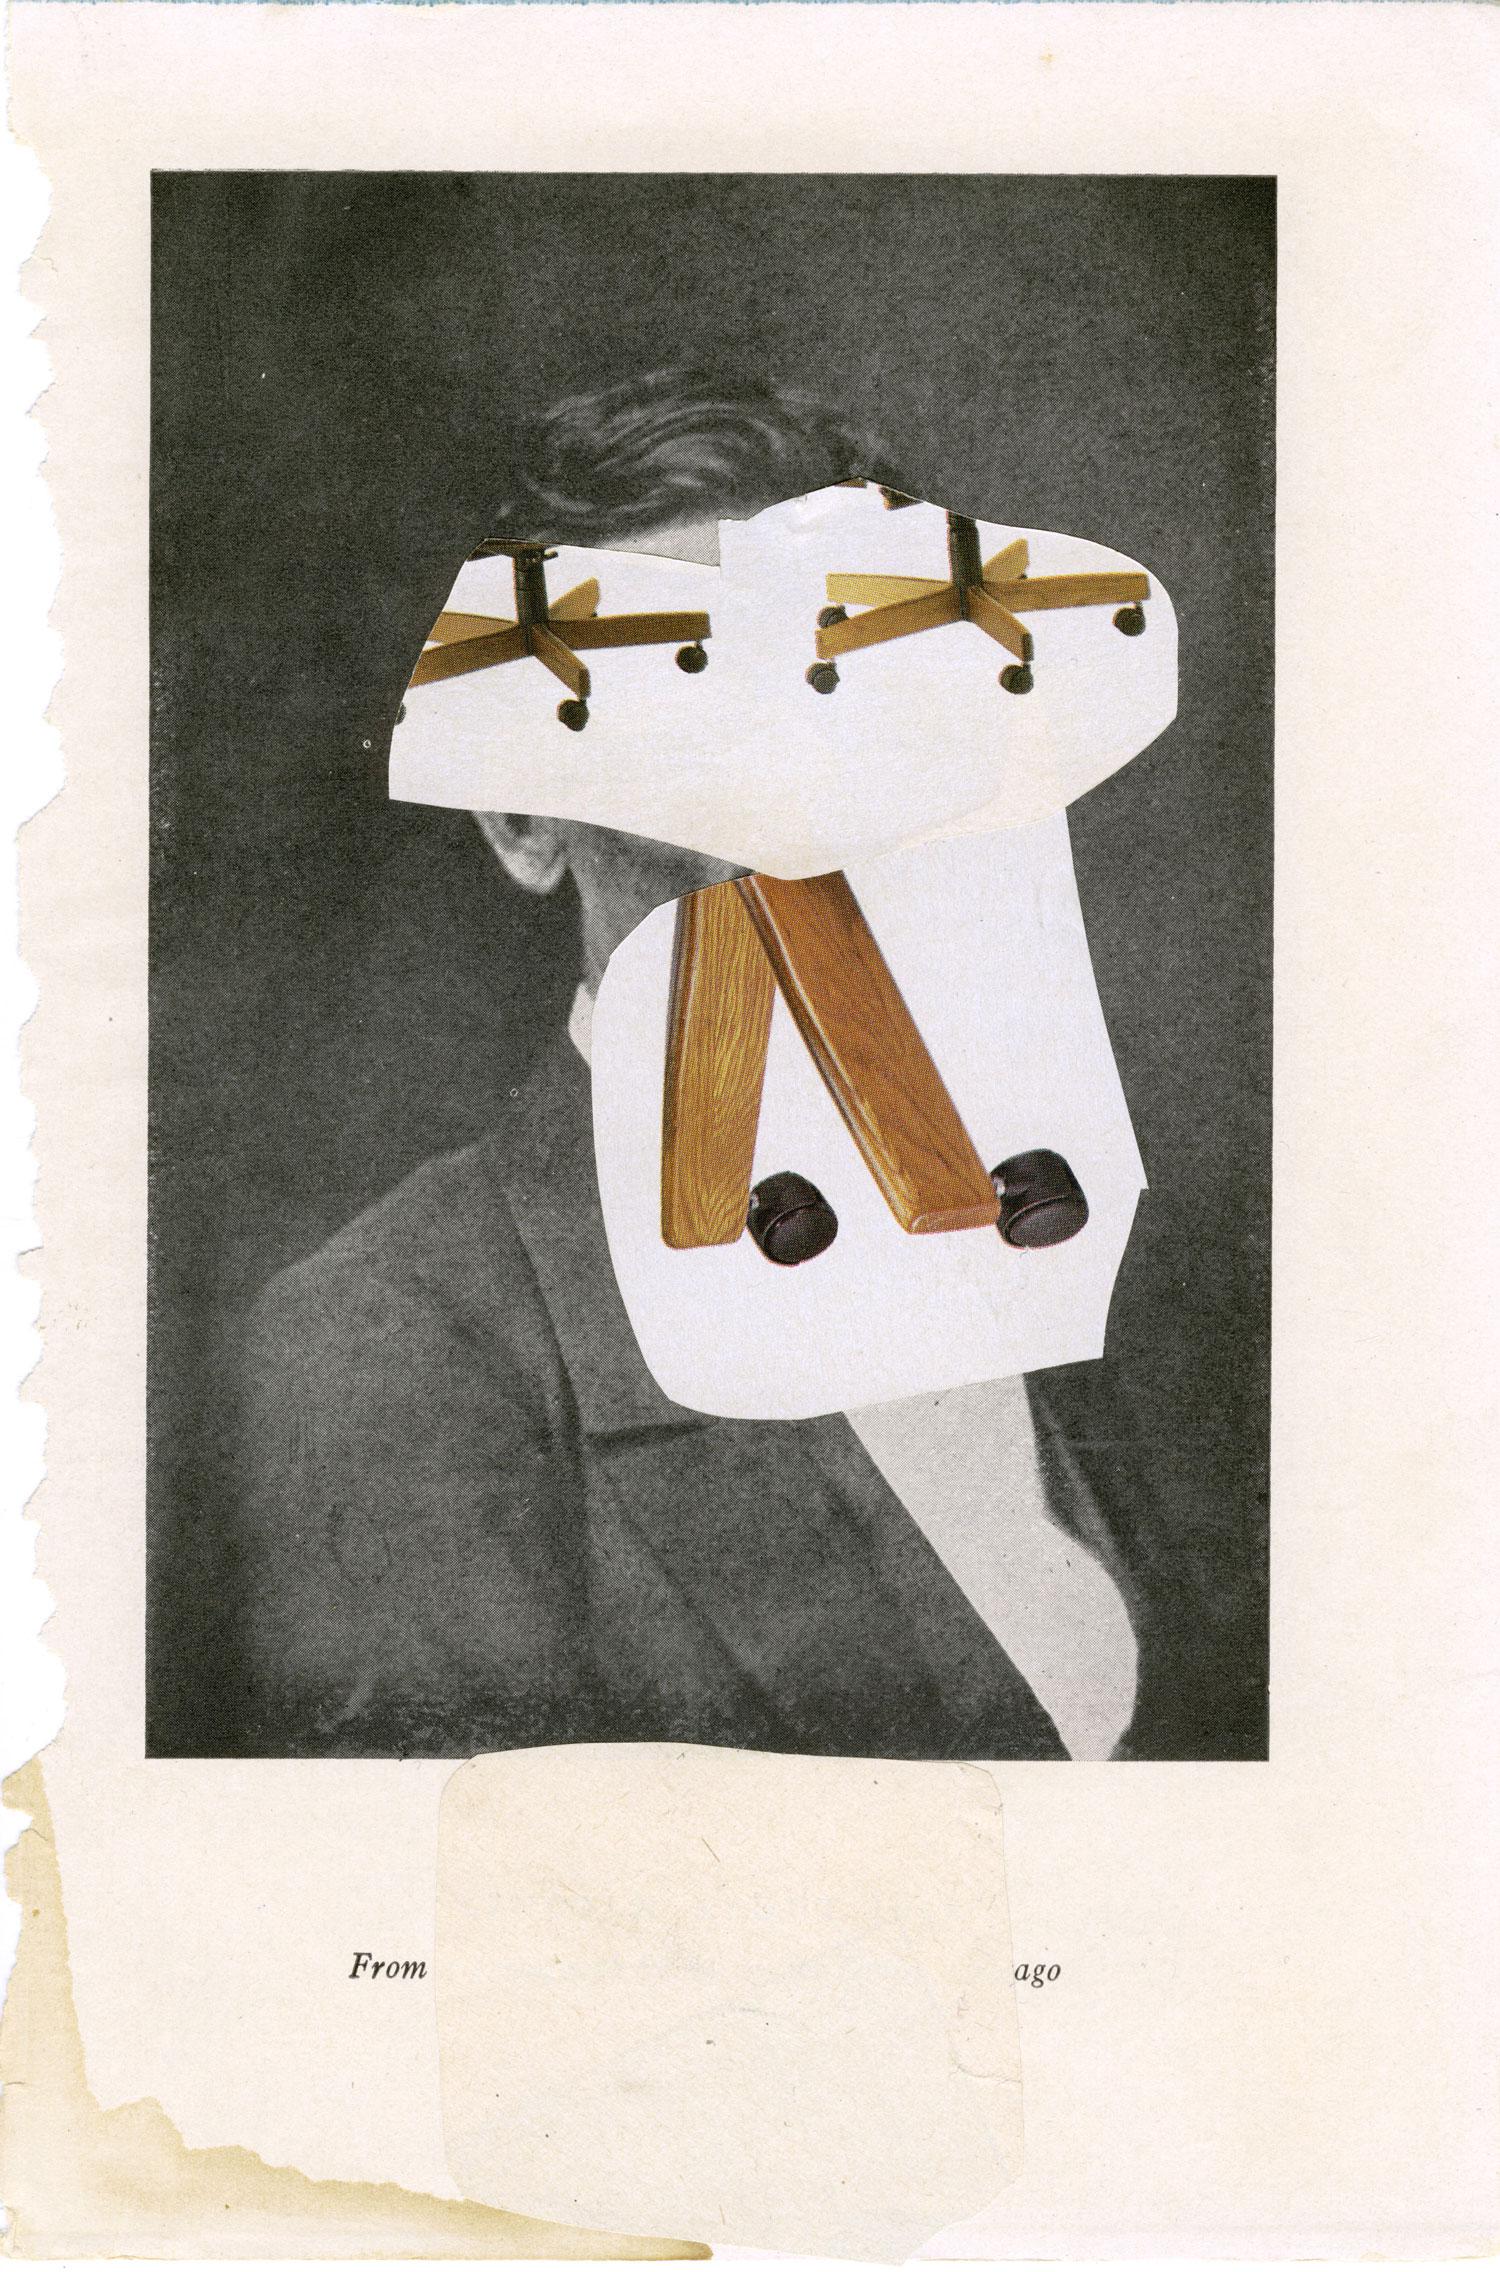 john-gall-collage-art-from-ago.jpg